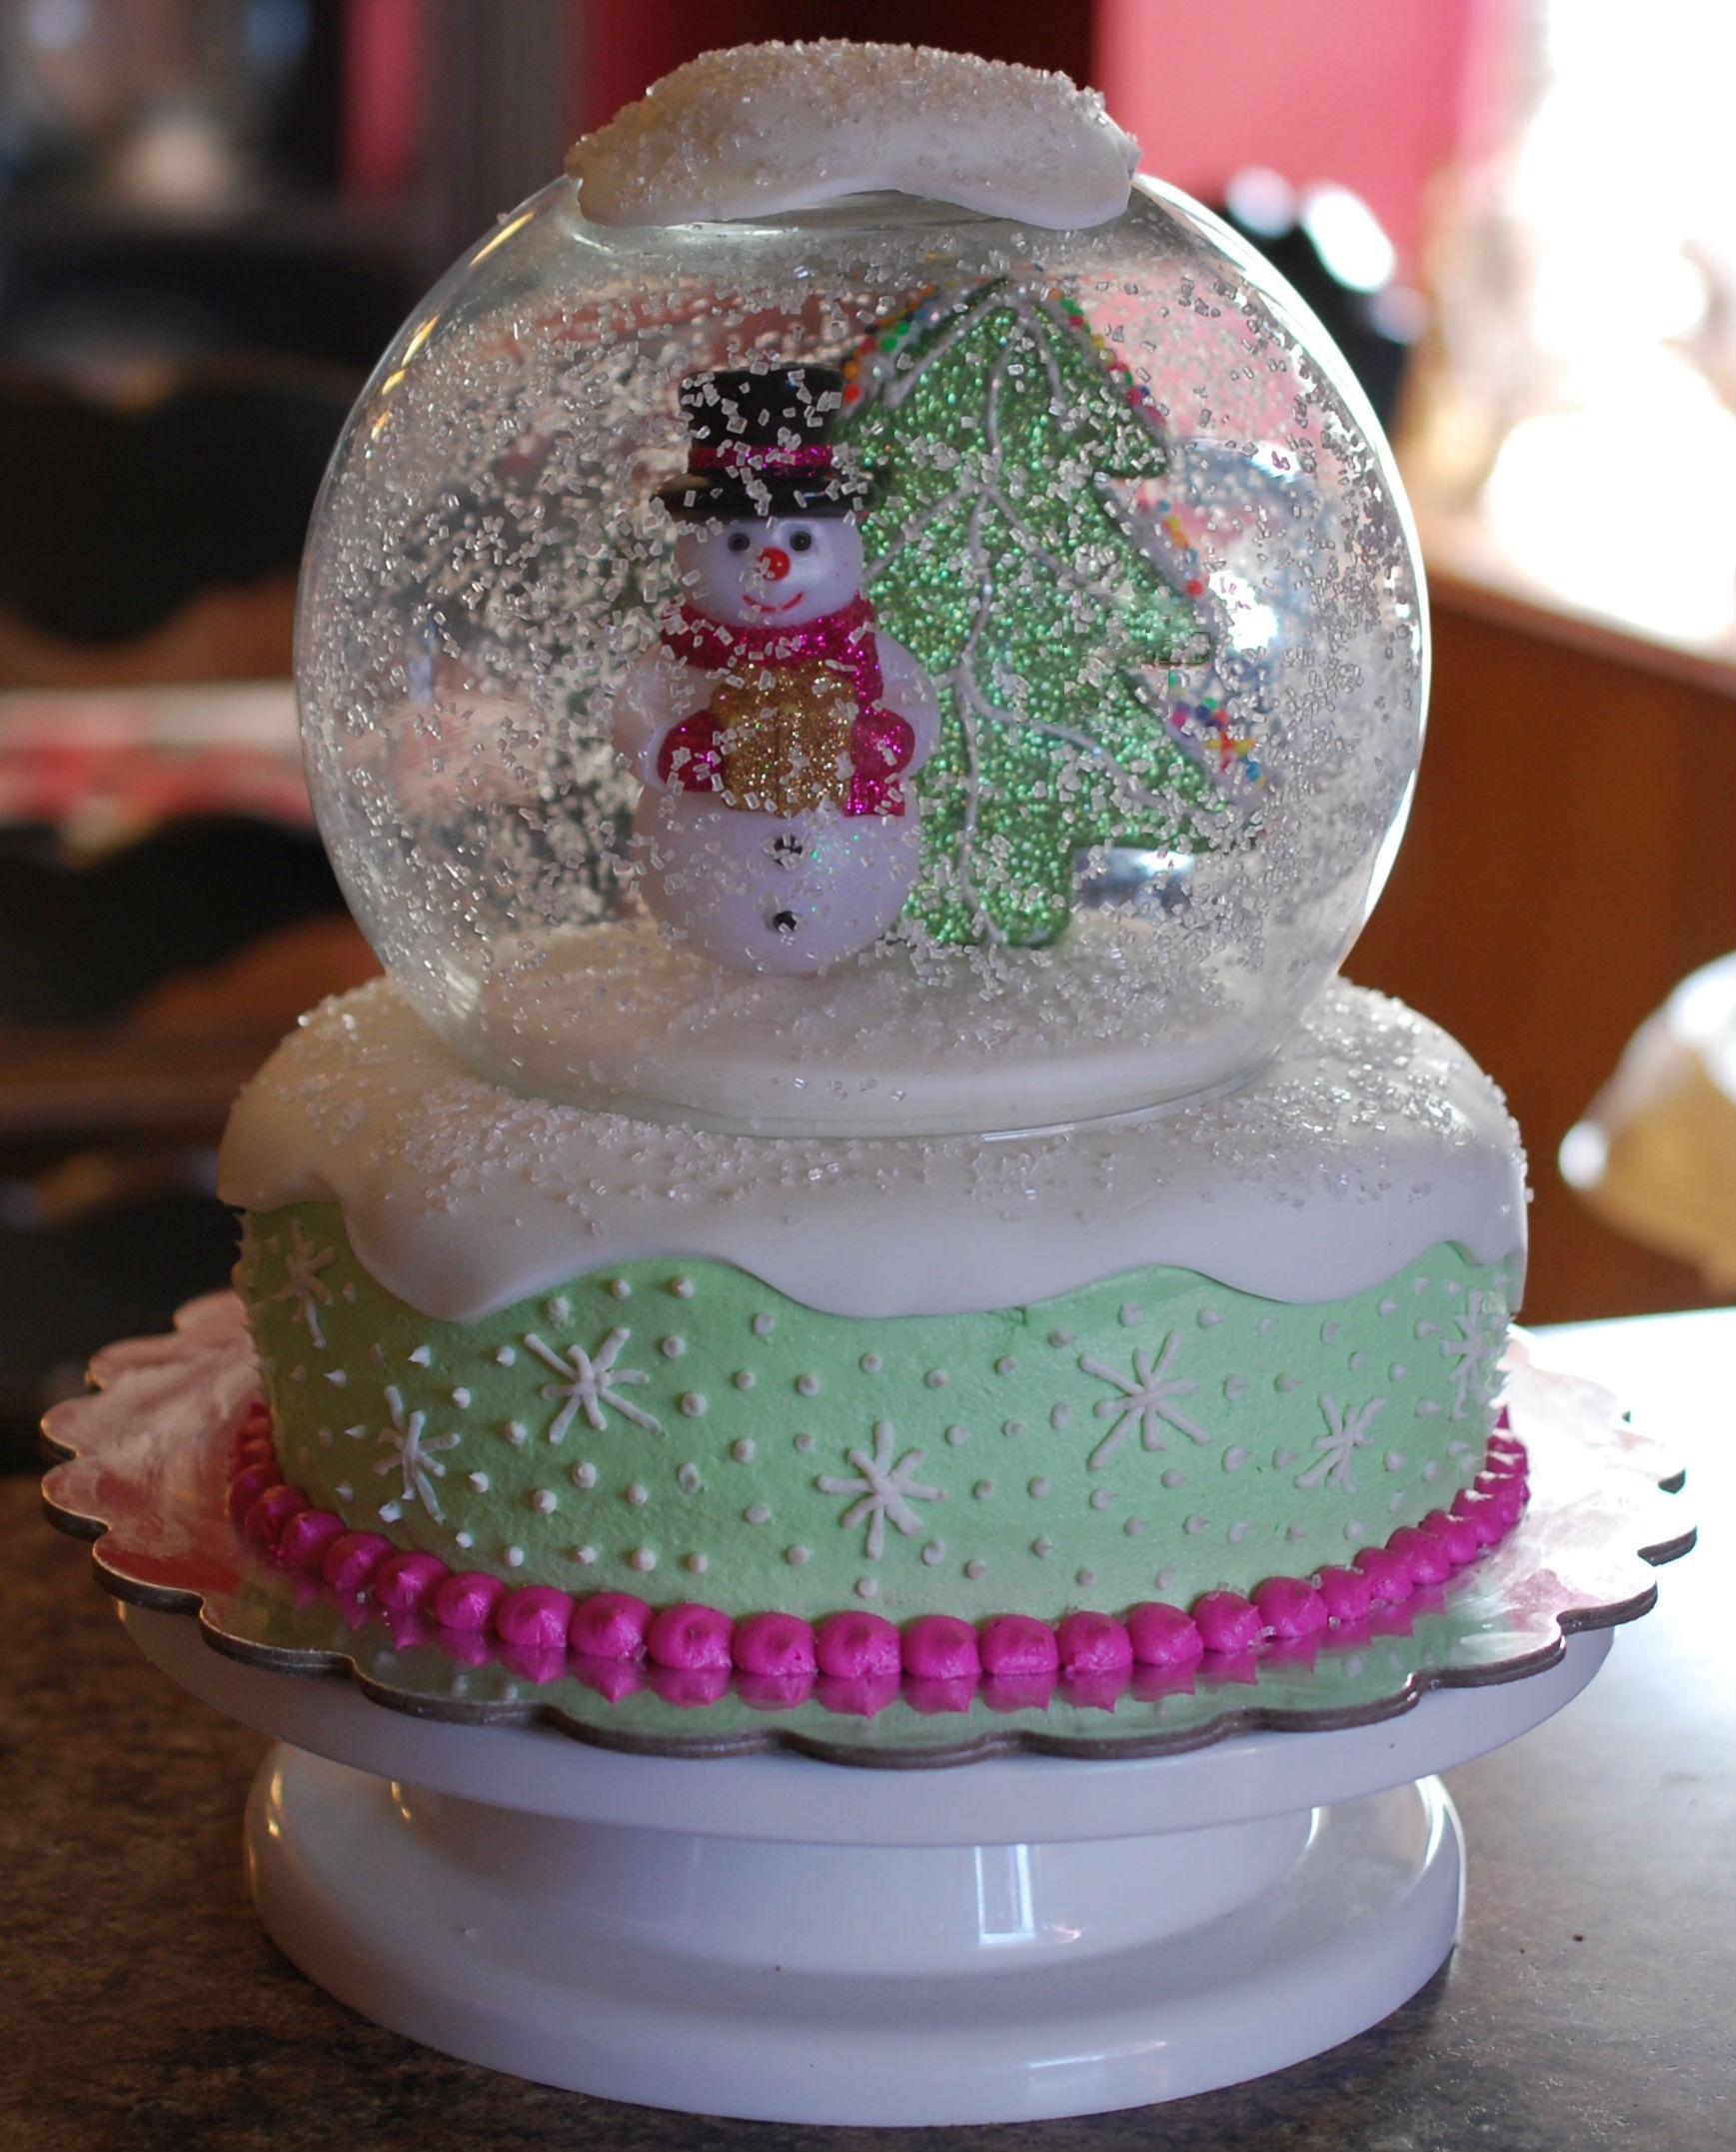 Snow Icing For Christmas Cake